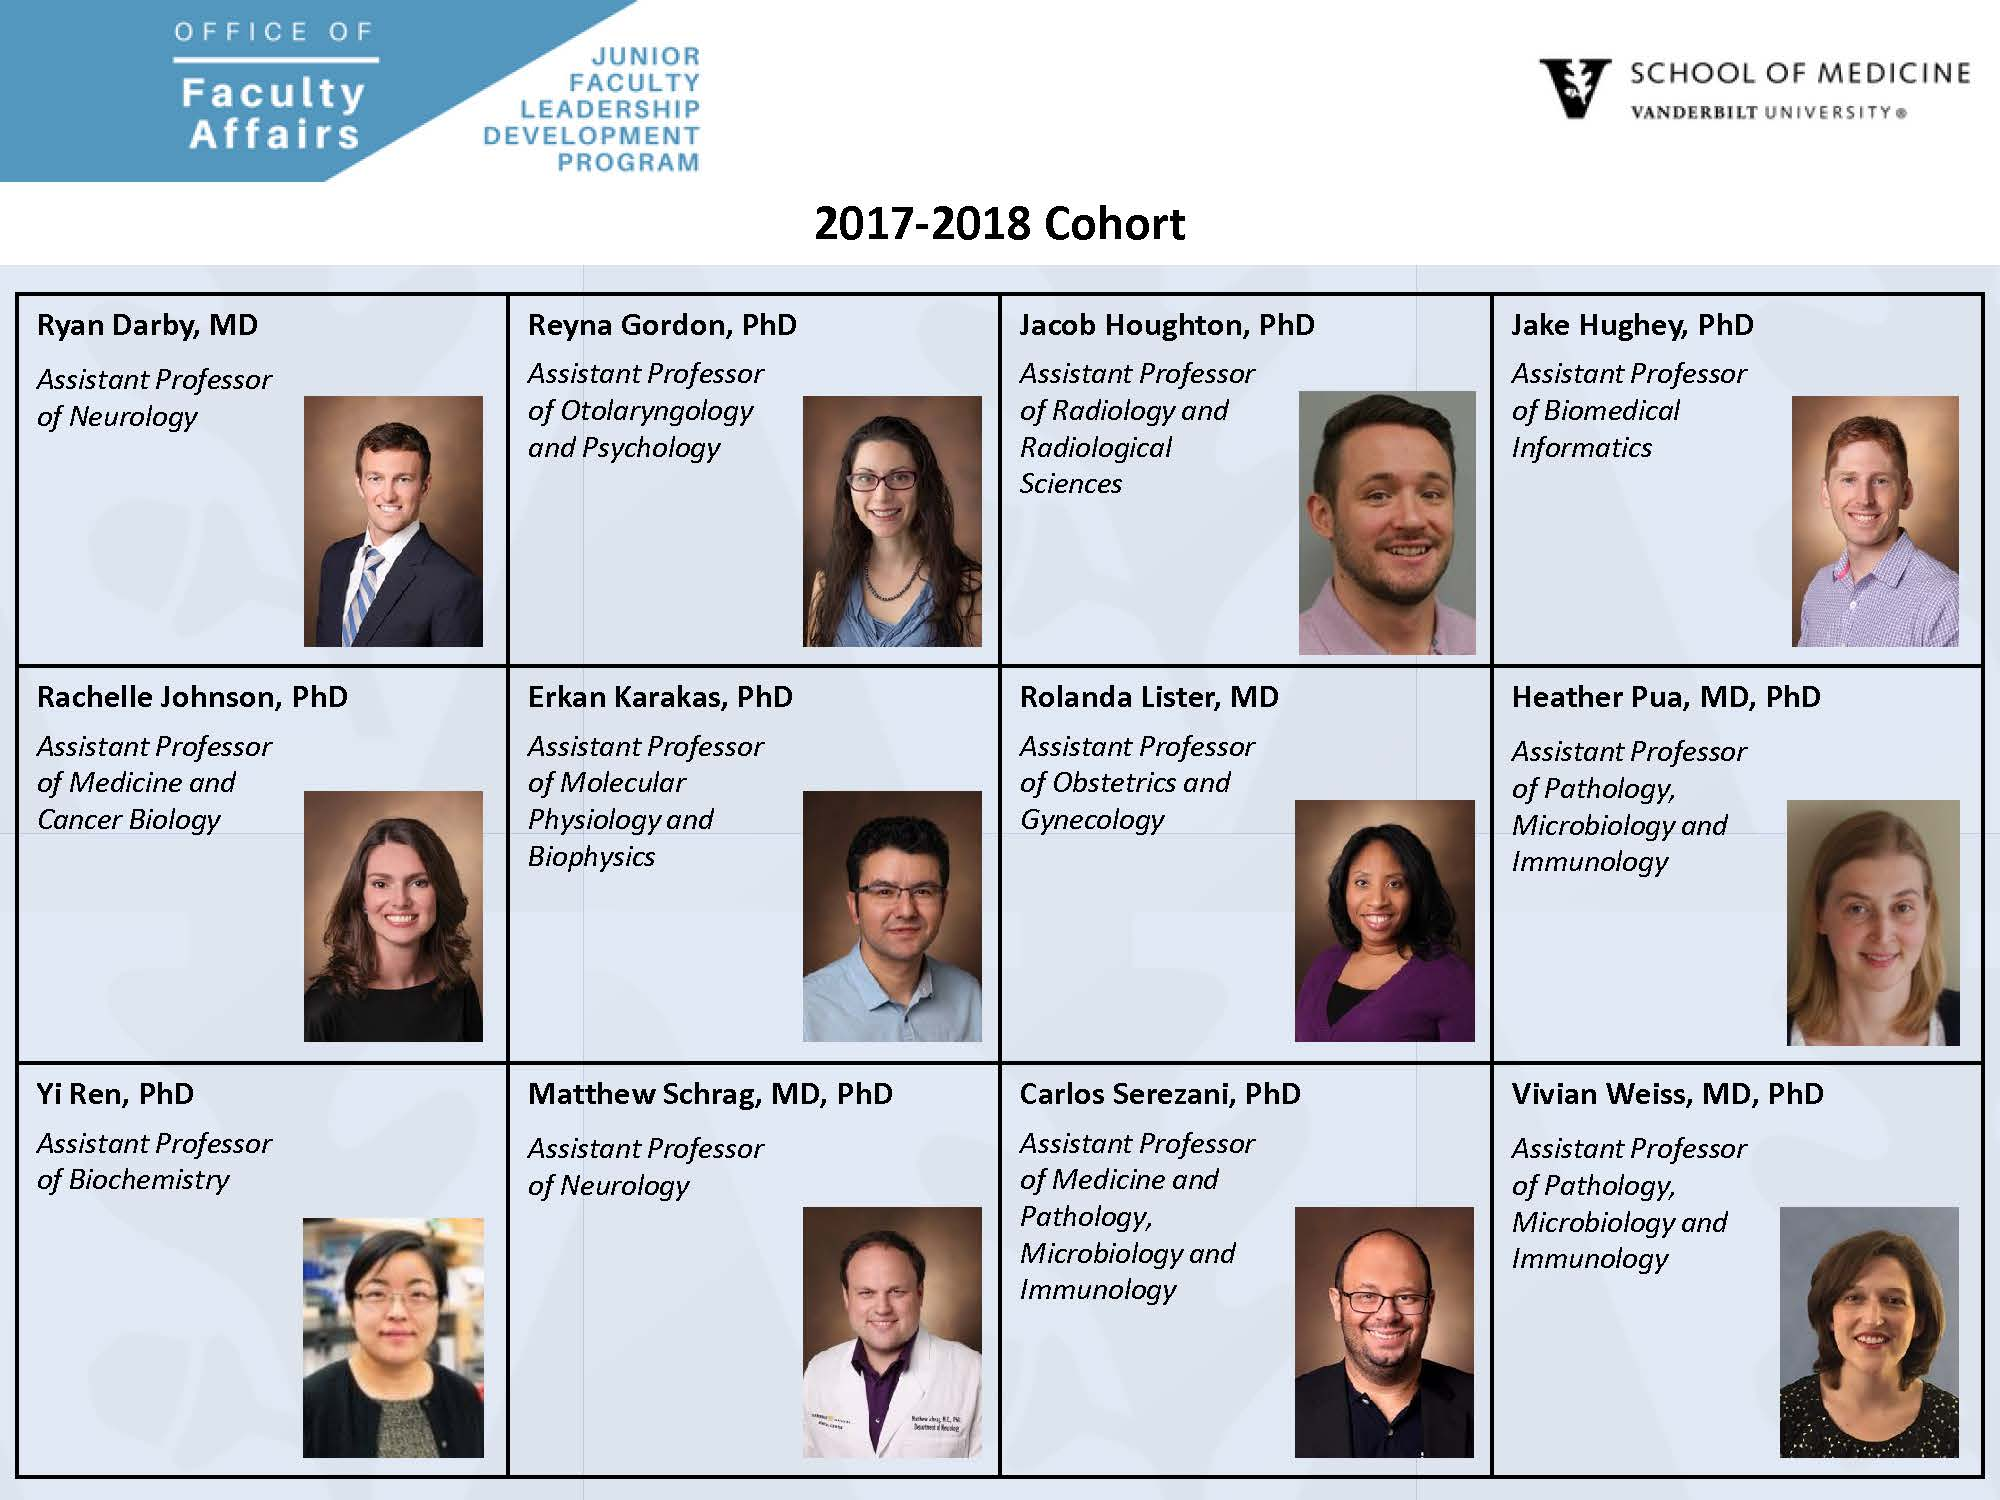 2017-2018 JFLDP Participant Roster.jpg